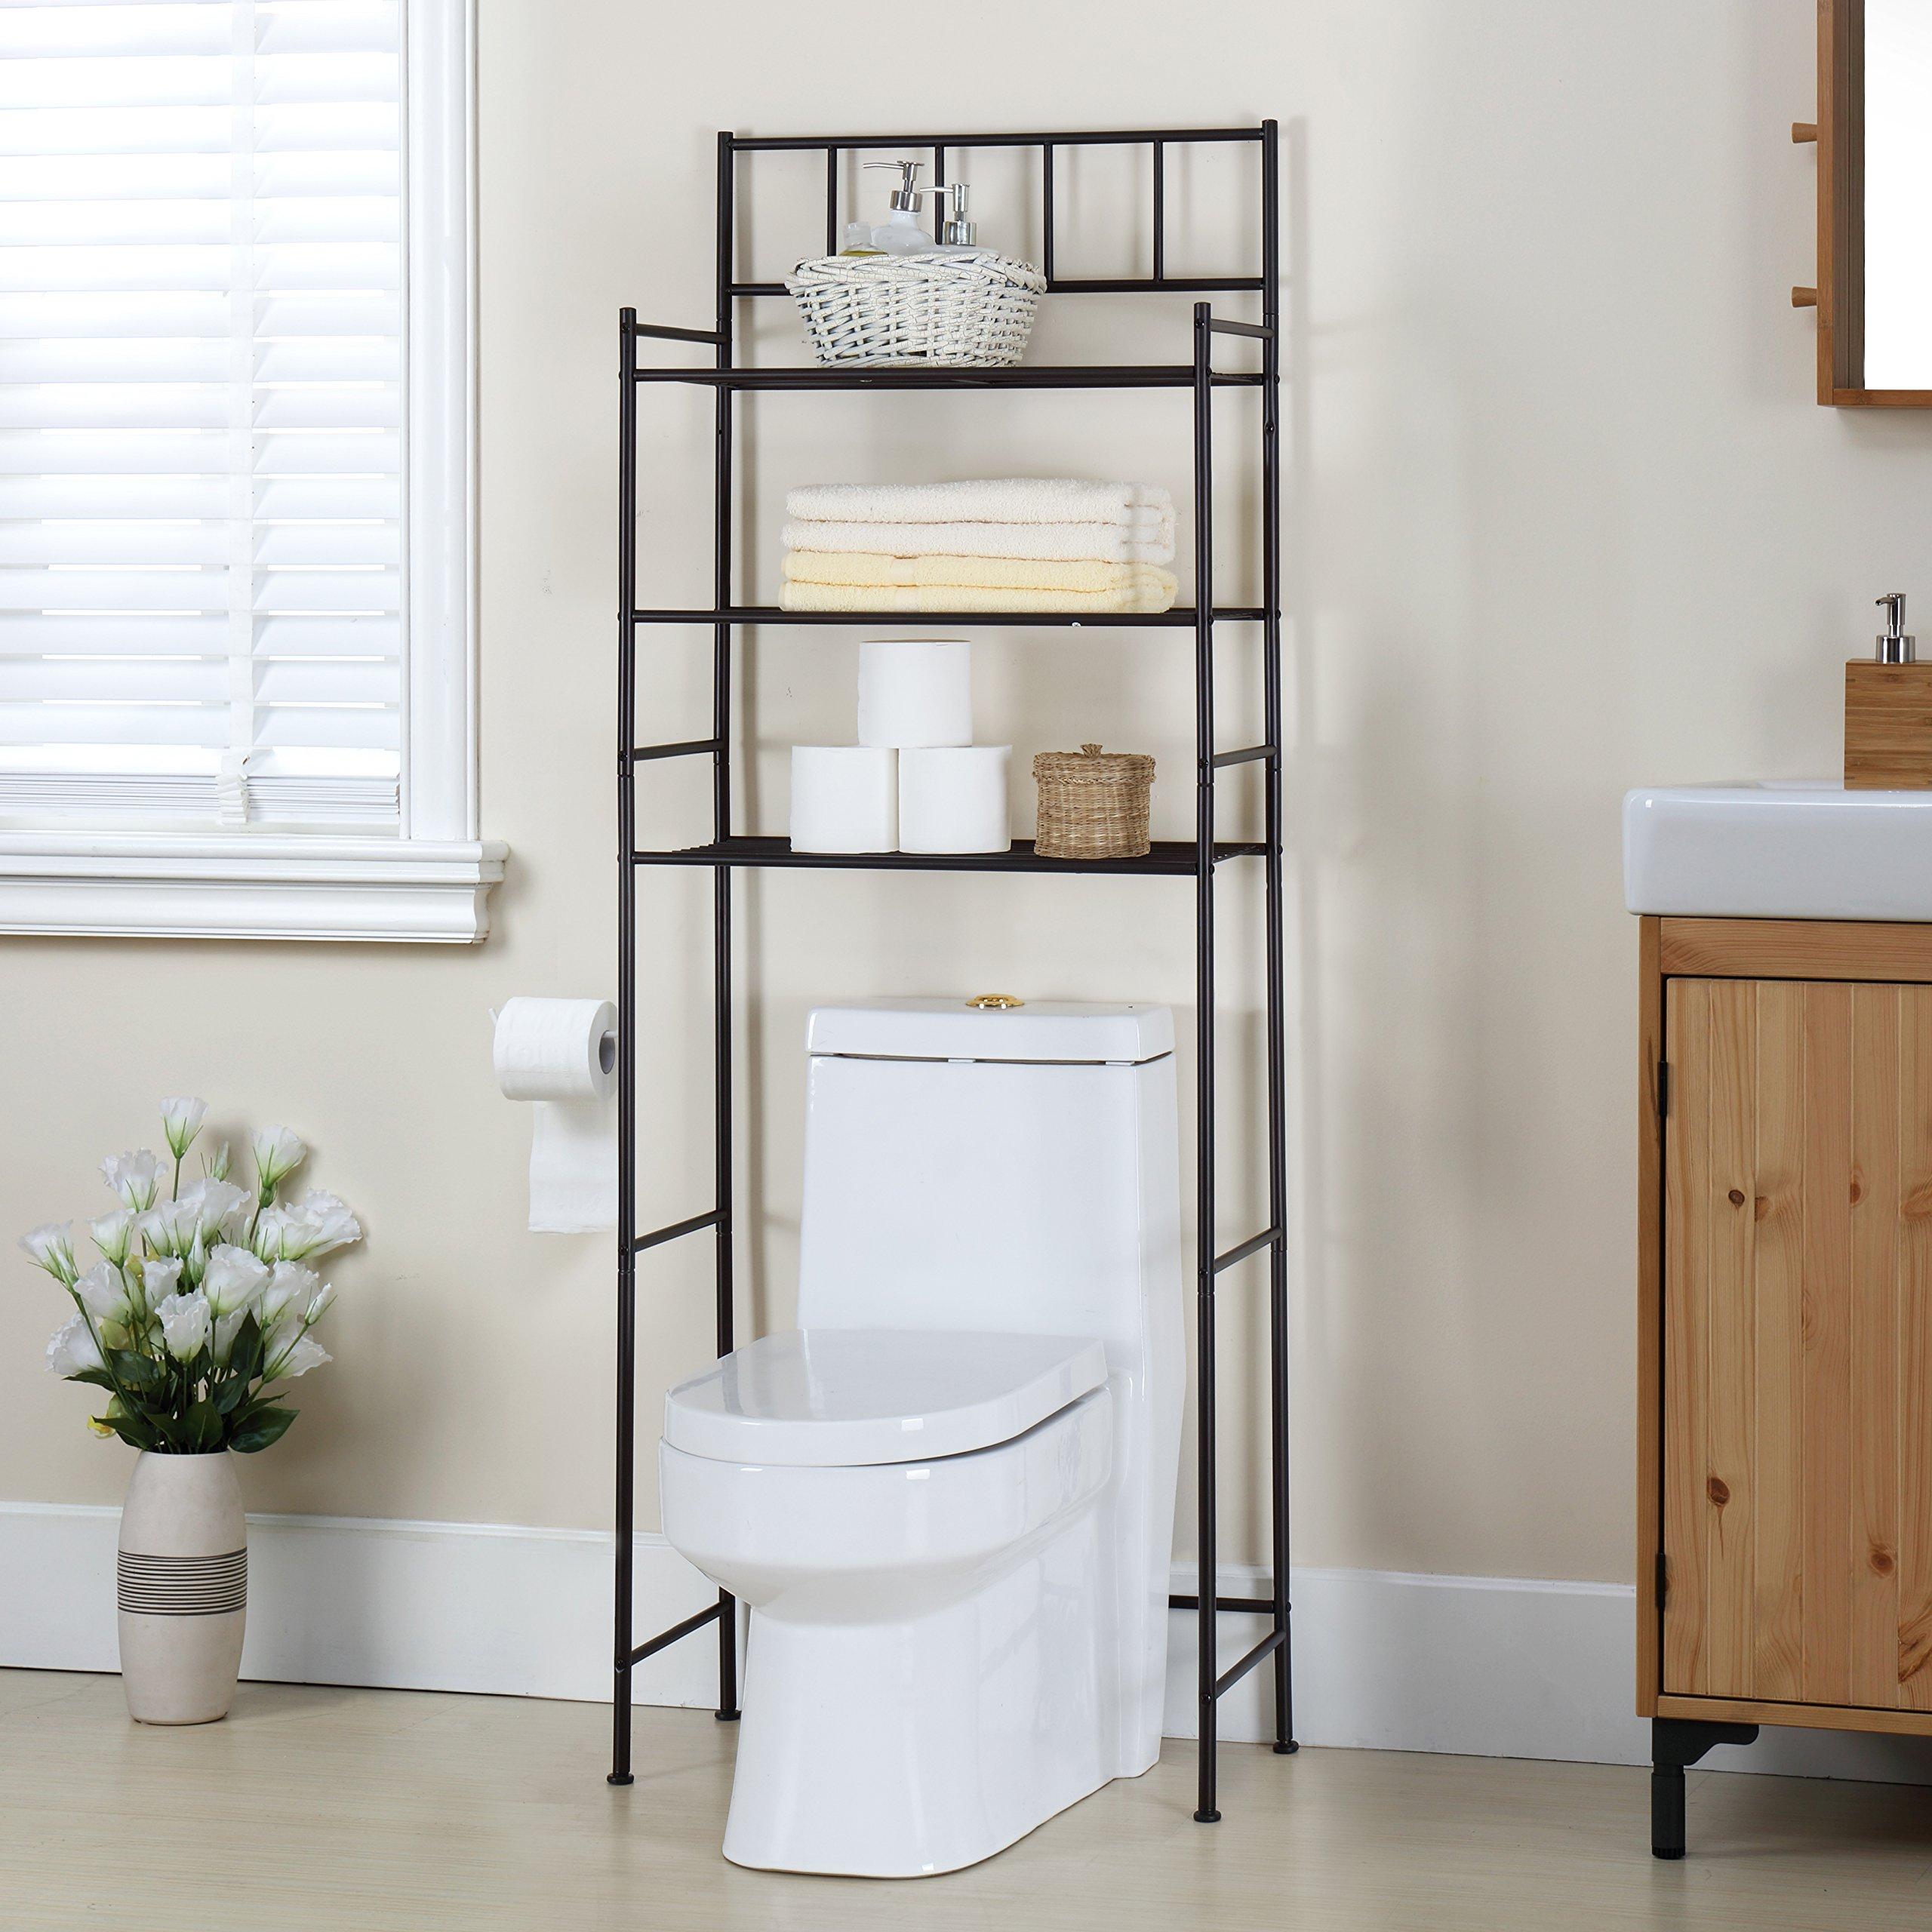 Finnhomy 3 Shelf Bathroom Space Saver Over The Toilet Rack Bathroom Corner Stand Storage Organizer Accessories Bathroom Cabinet Tower Shelf with ORB Finish 23.5'' W x 10.5'' D x 64.5'' H by Finnhomy